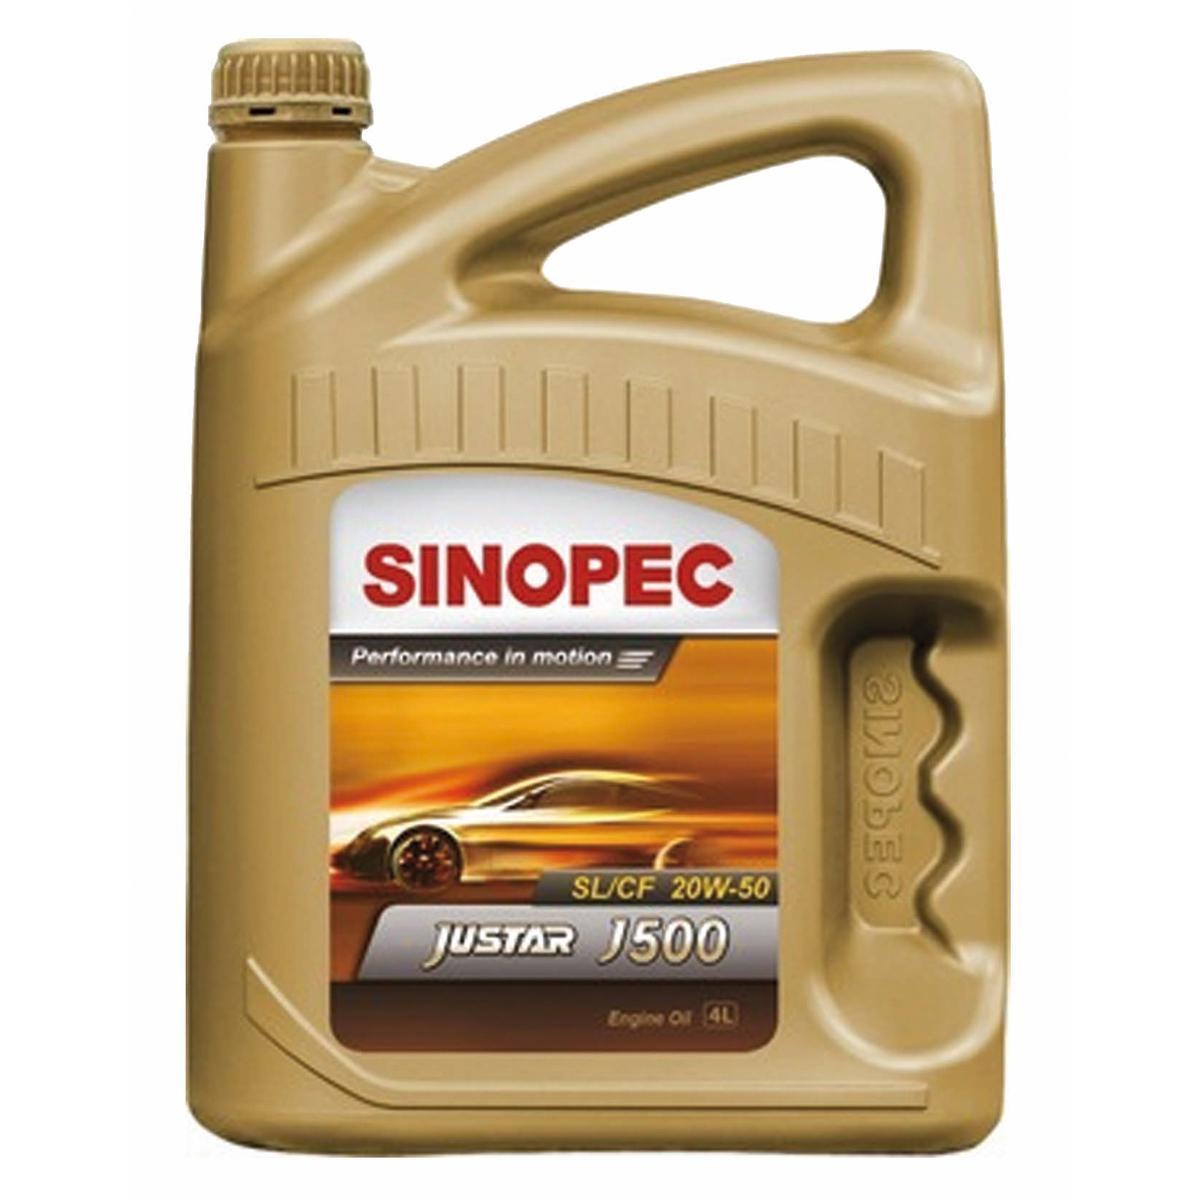 Sinopec-Justar-J500-20W-50-SL-CF-Engine-Oil-1.jpg